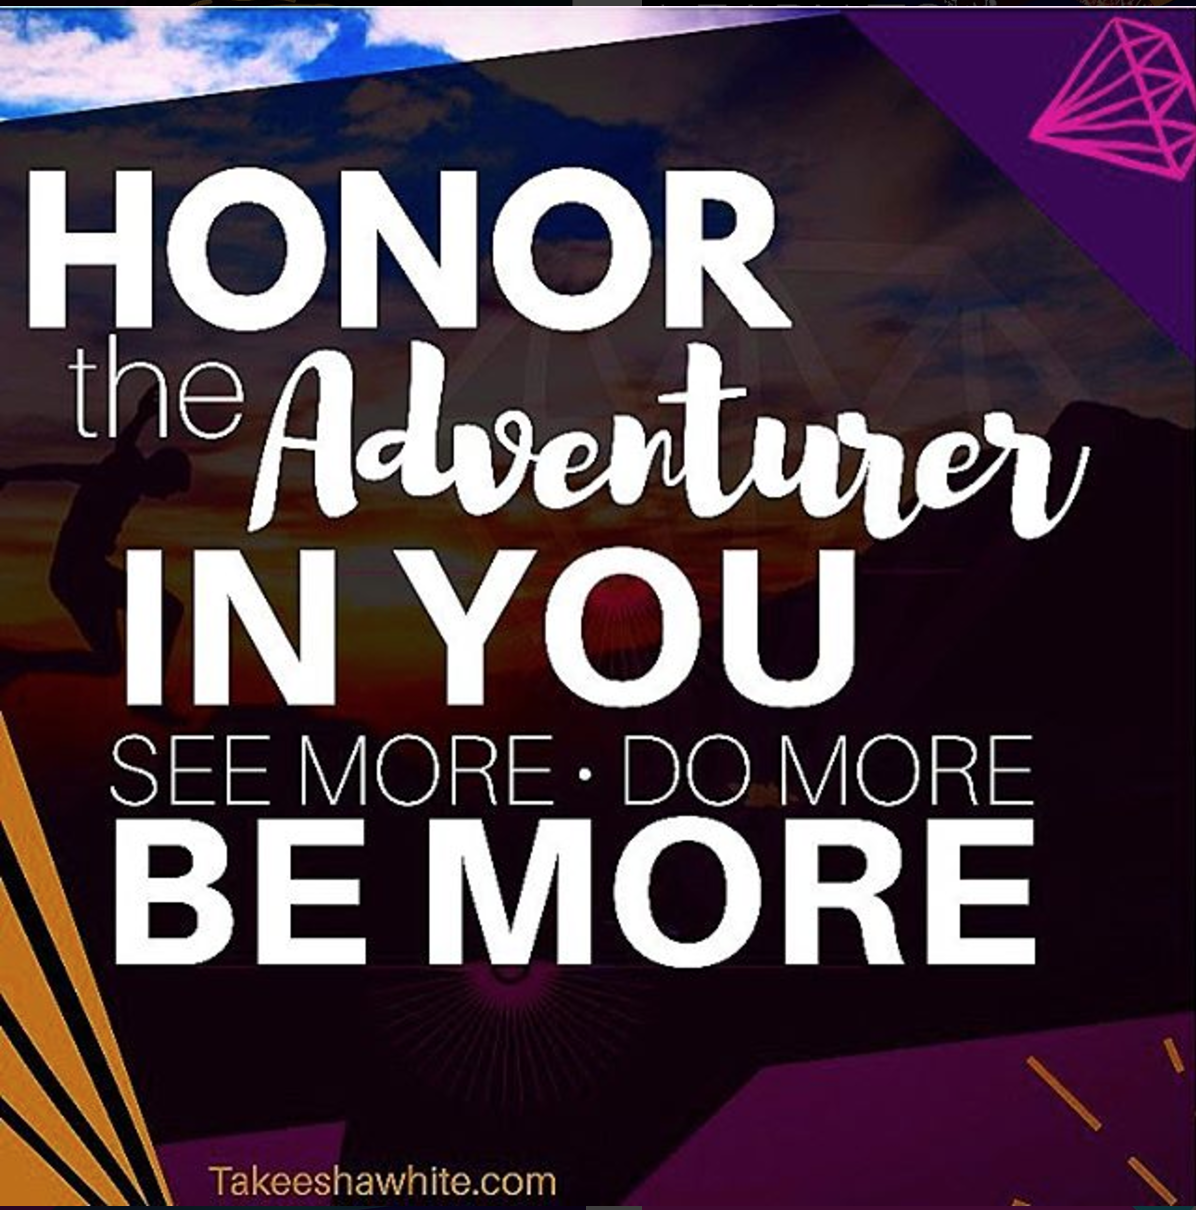 Honor the Adventurer